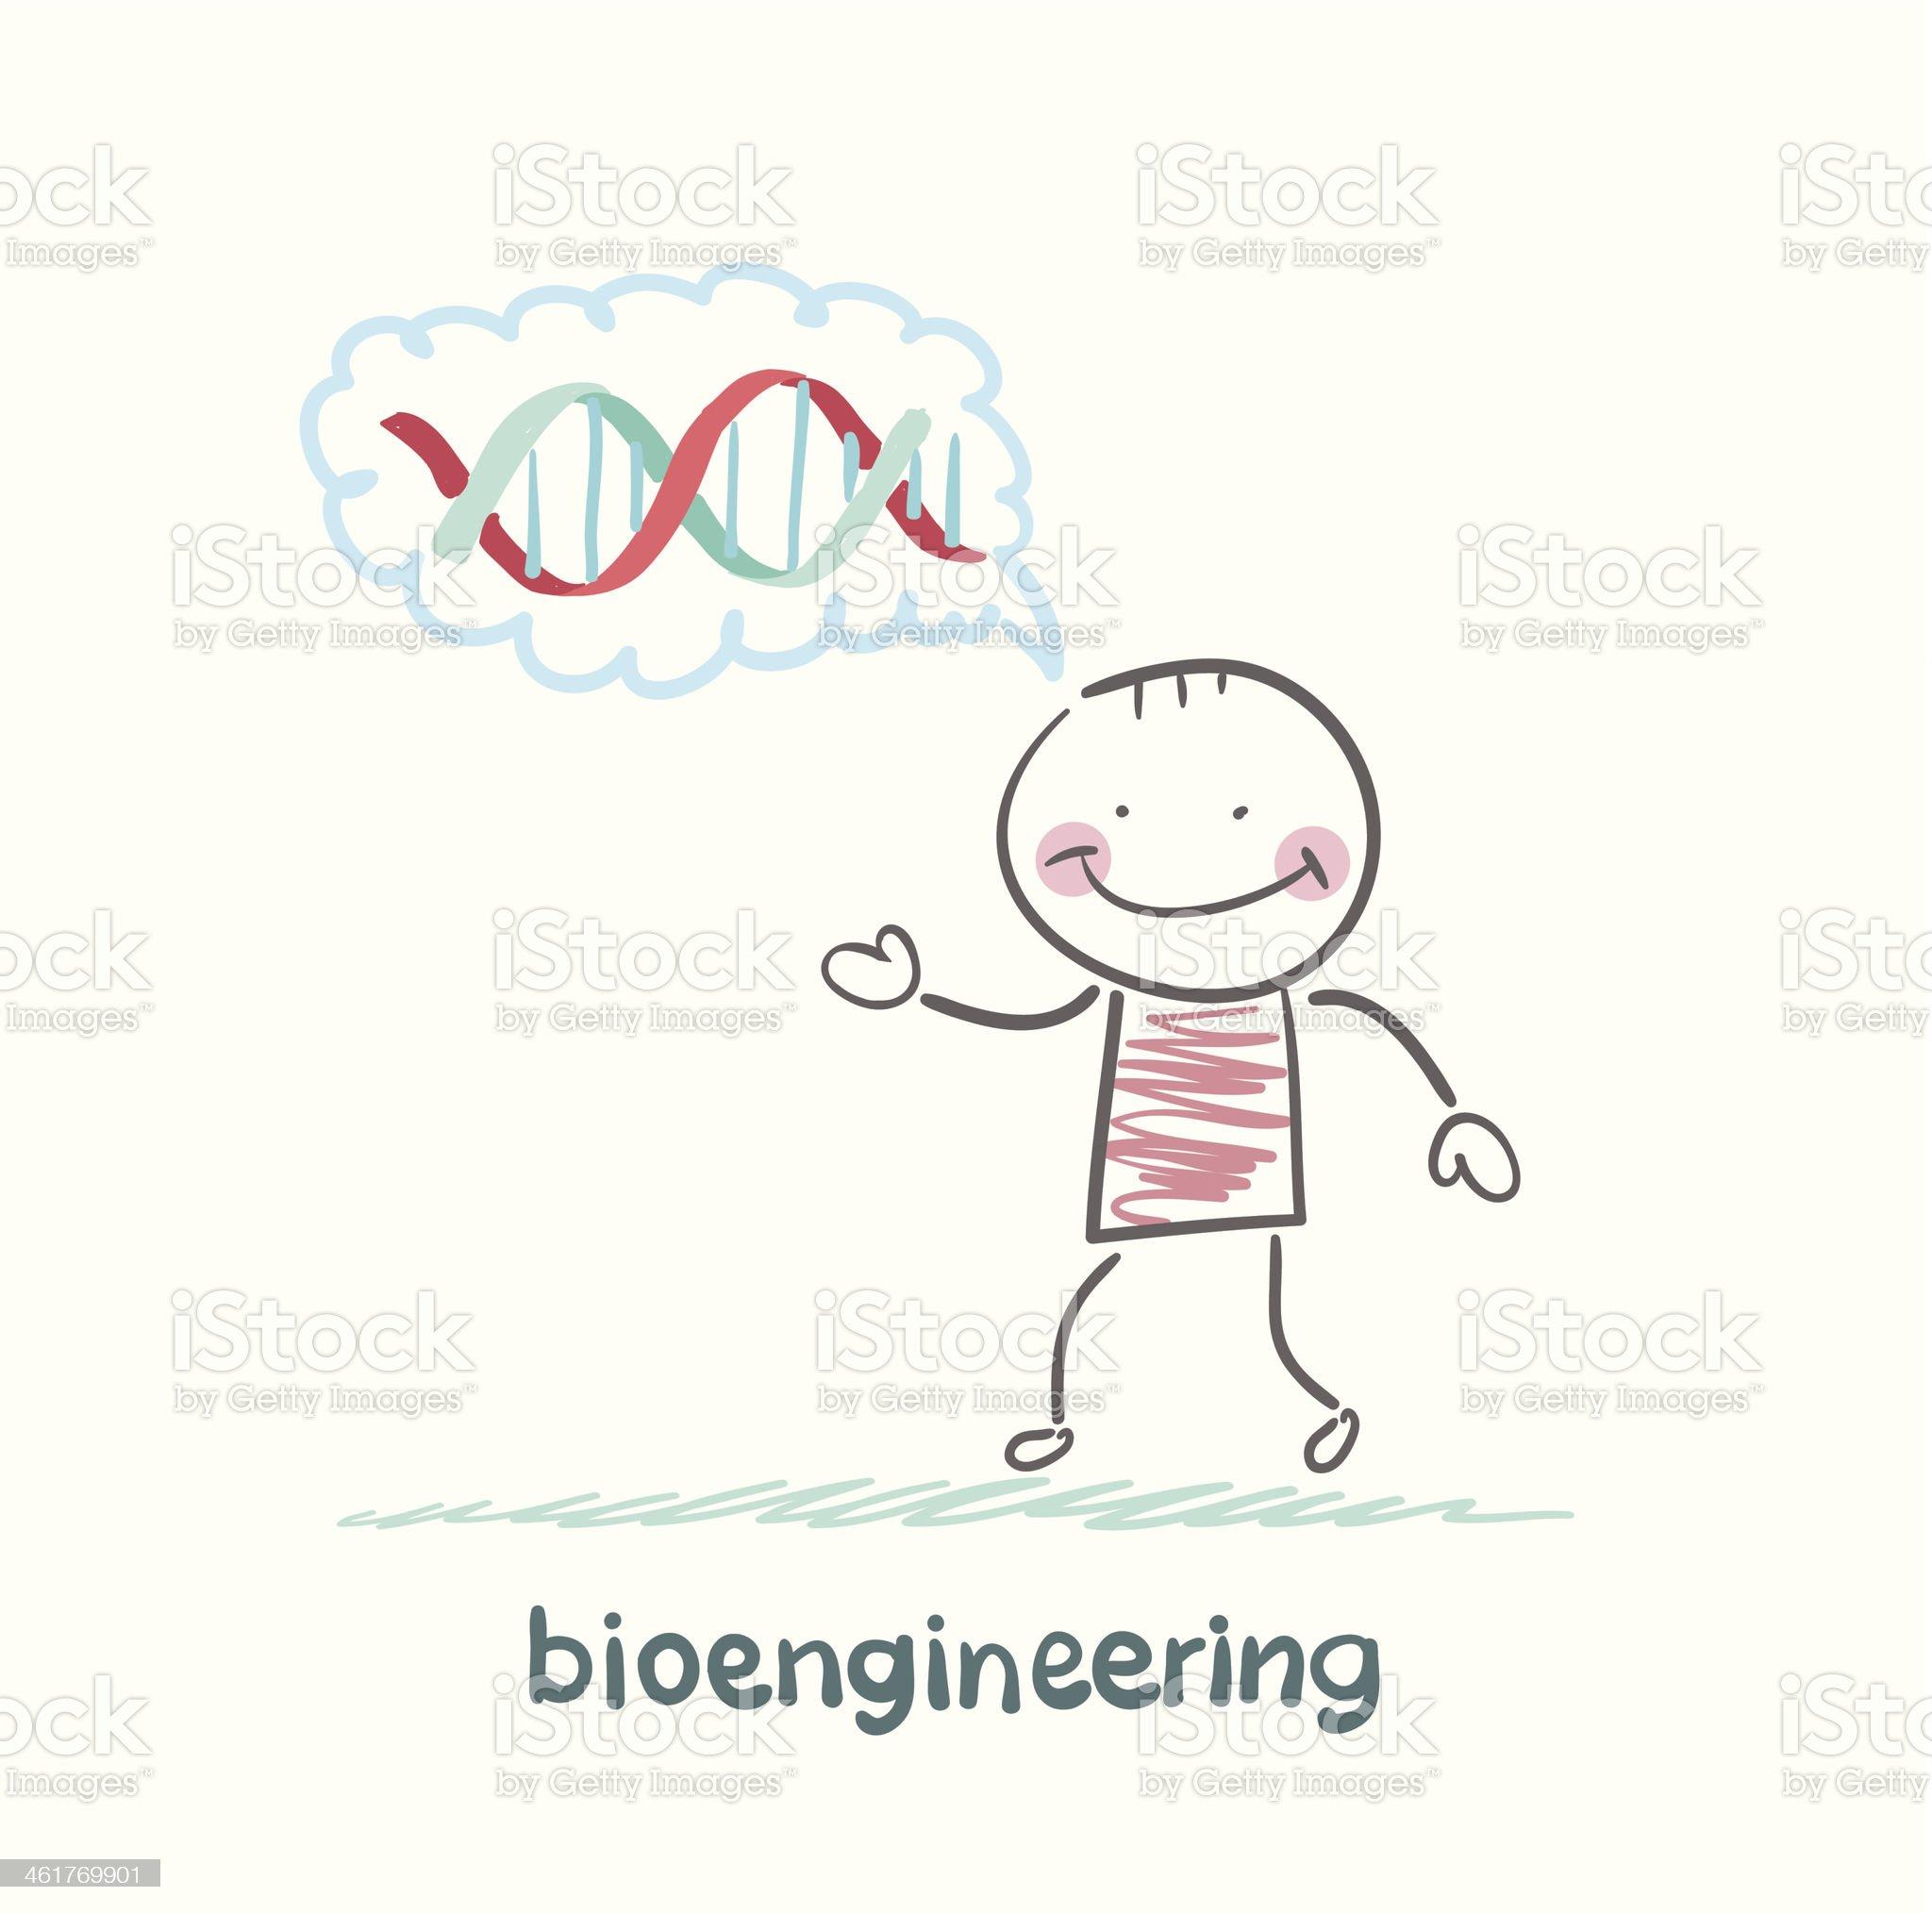 bioengineer thinks of human DNA royalty-free stock vector art